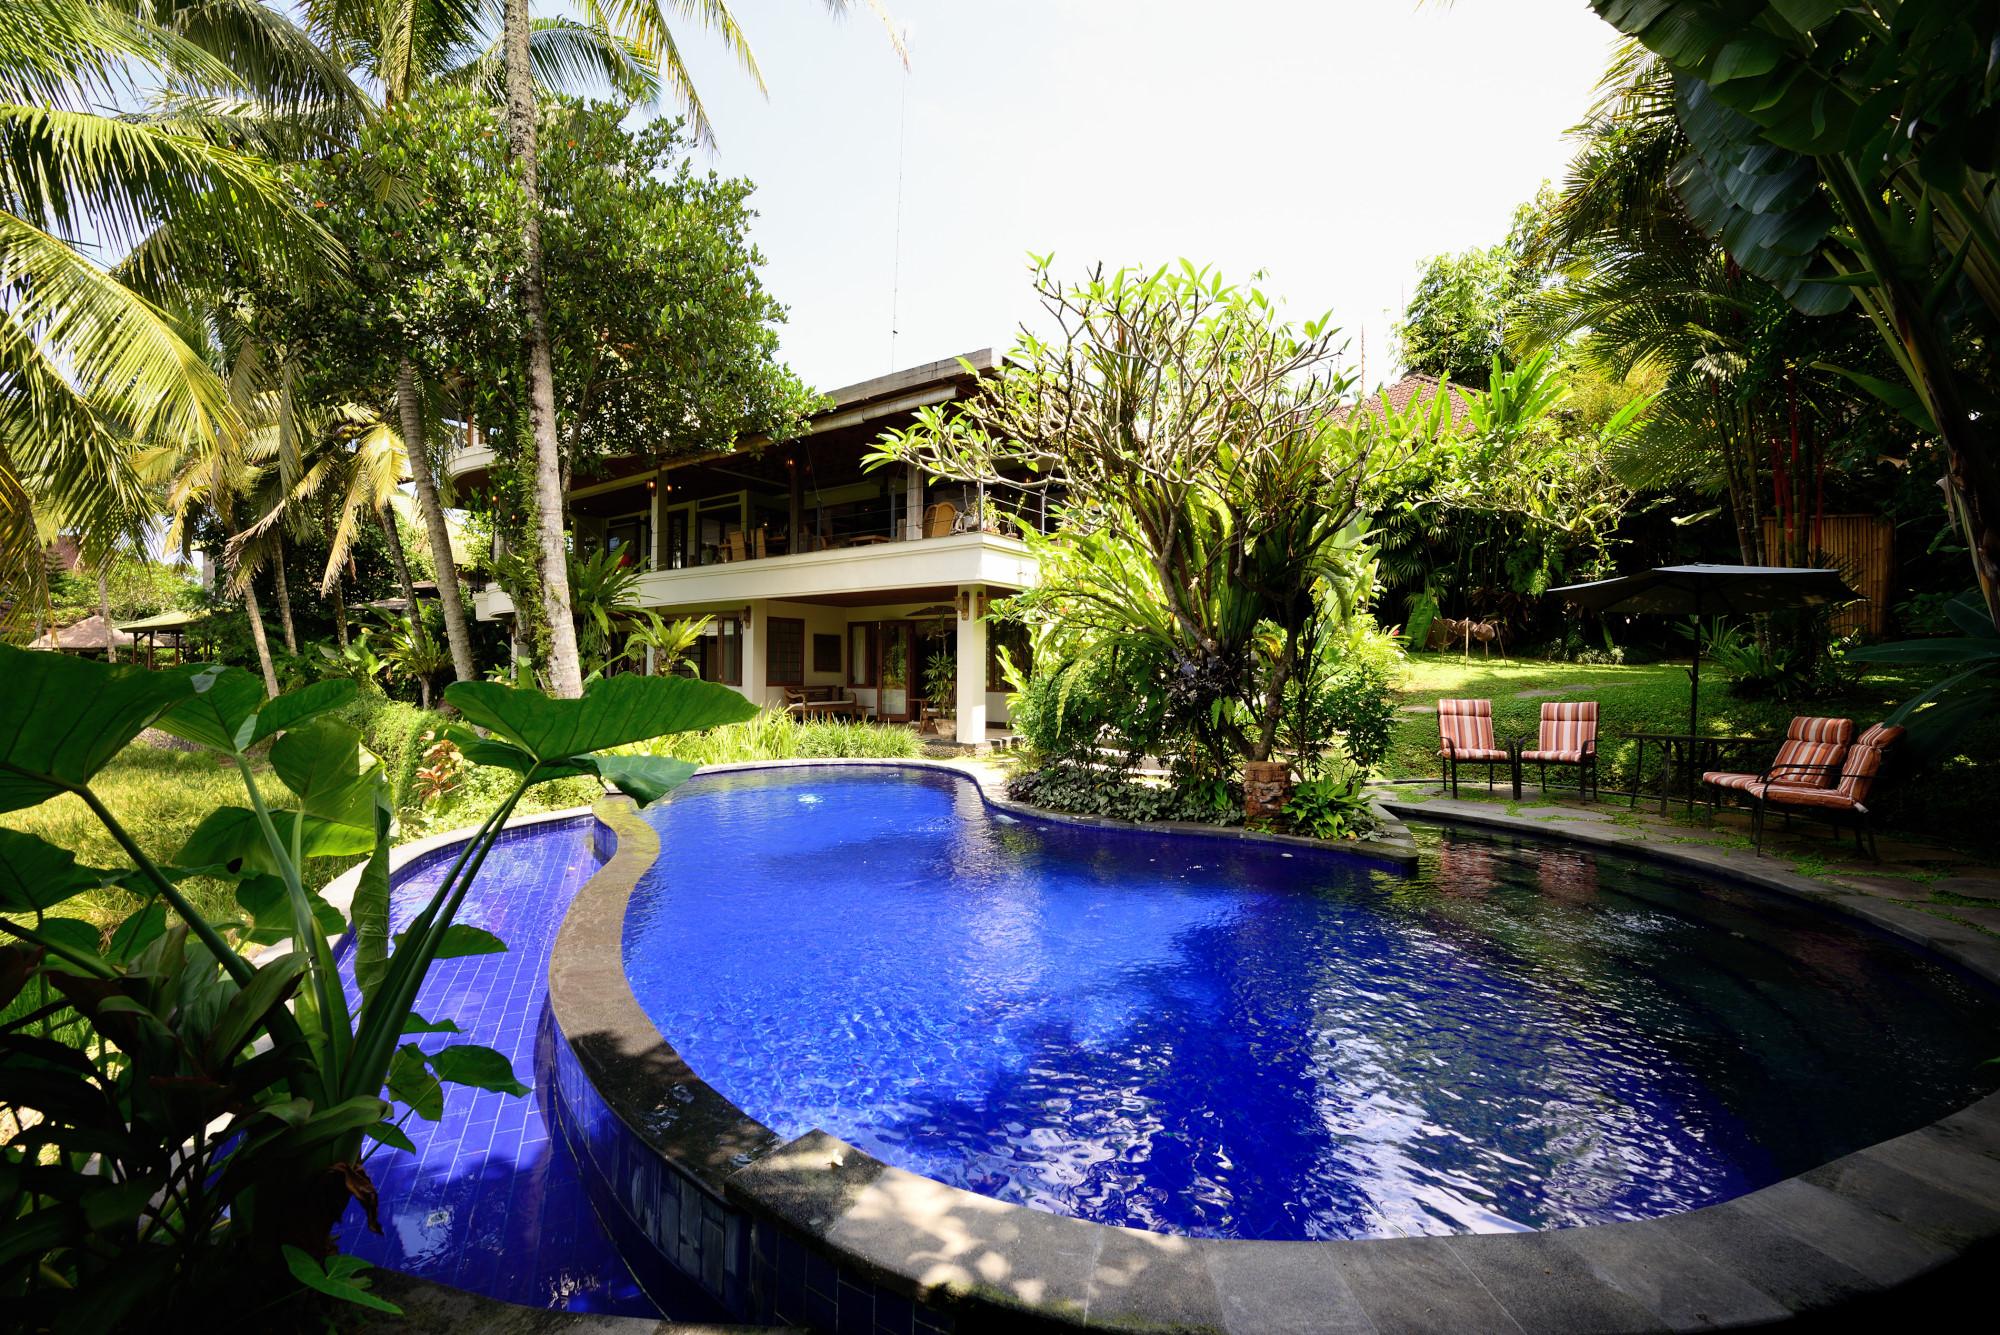 Singapore hotel photographer, architecture photographer, villa photographer, hospitality photography, singapore photographer, Koh Lanta Photographer, Luxury resort photography, hospitality photographer, Bali villa photographer